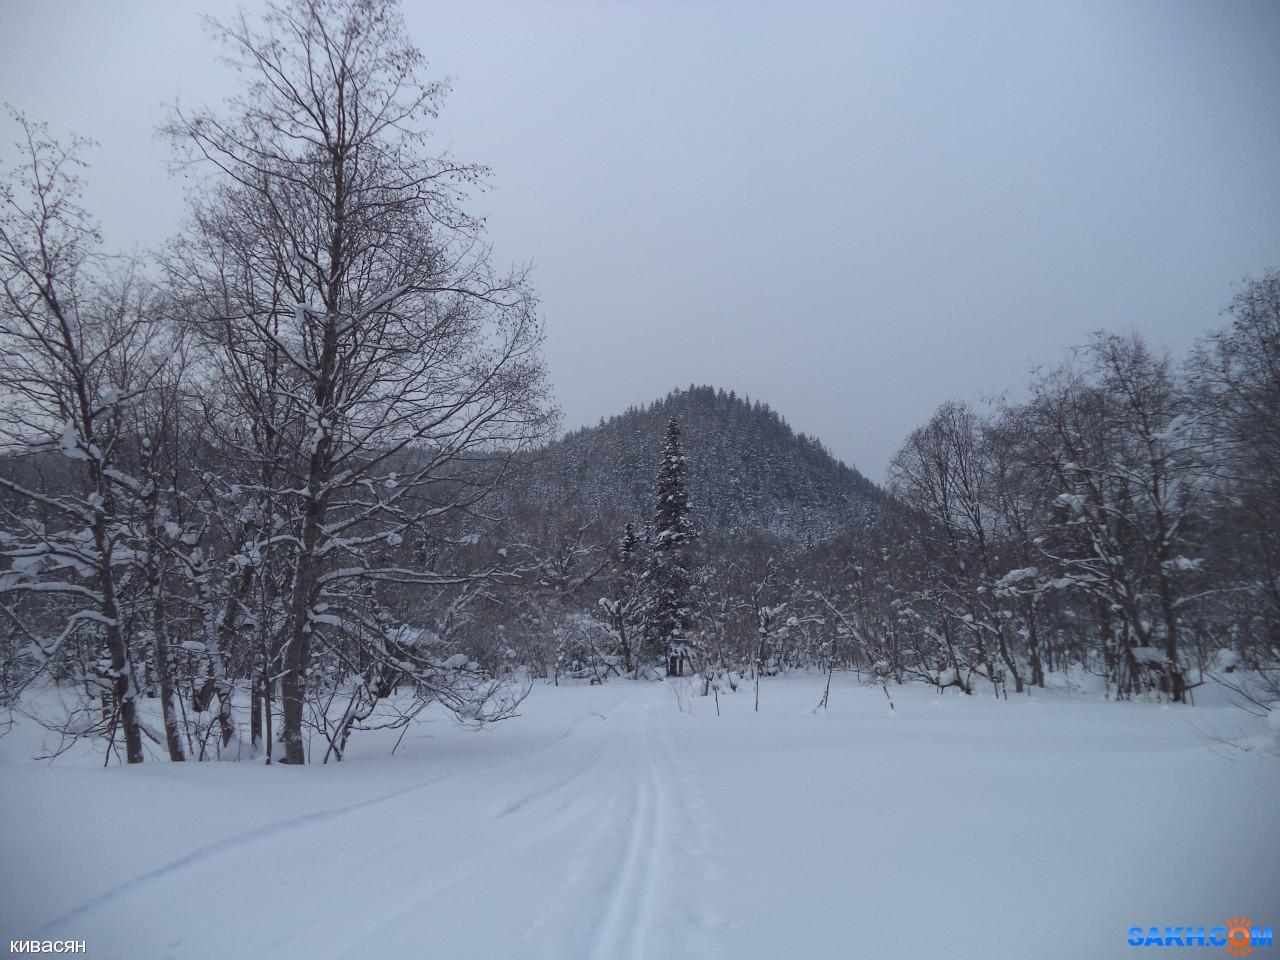 кивасян: DSC00006